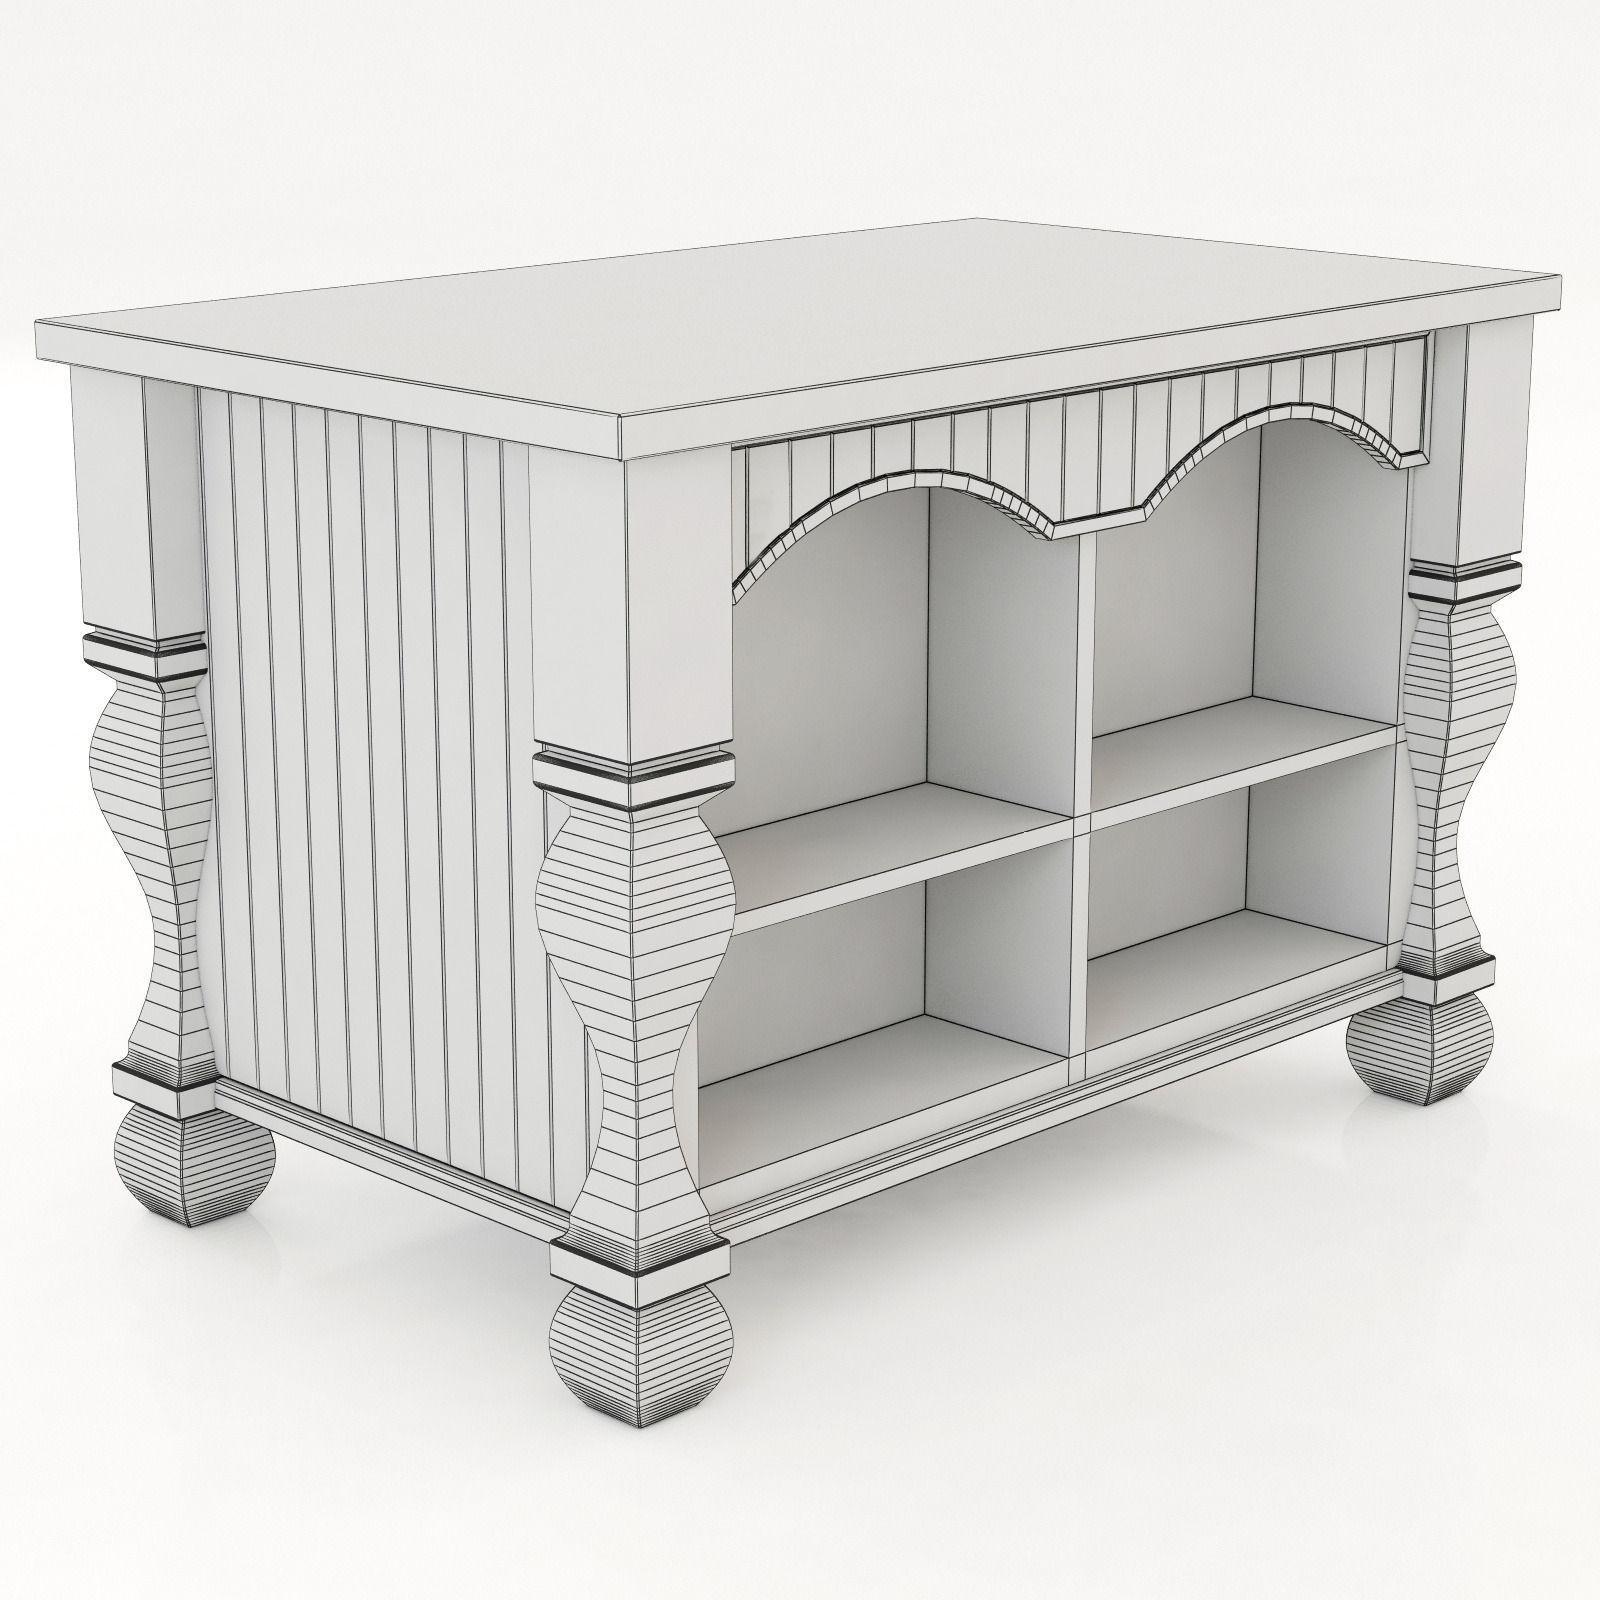 Kitchen island lyn design -  Lyn Design By Hardware Resources Tuscan Kitchen Island 3d Model Max Obj 3ds Fbx Mtl 7